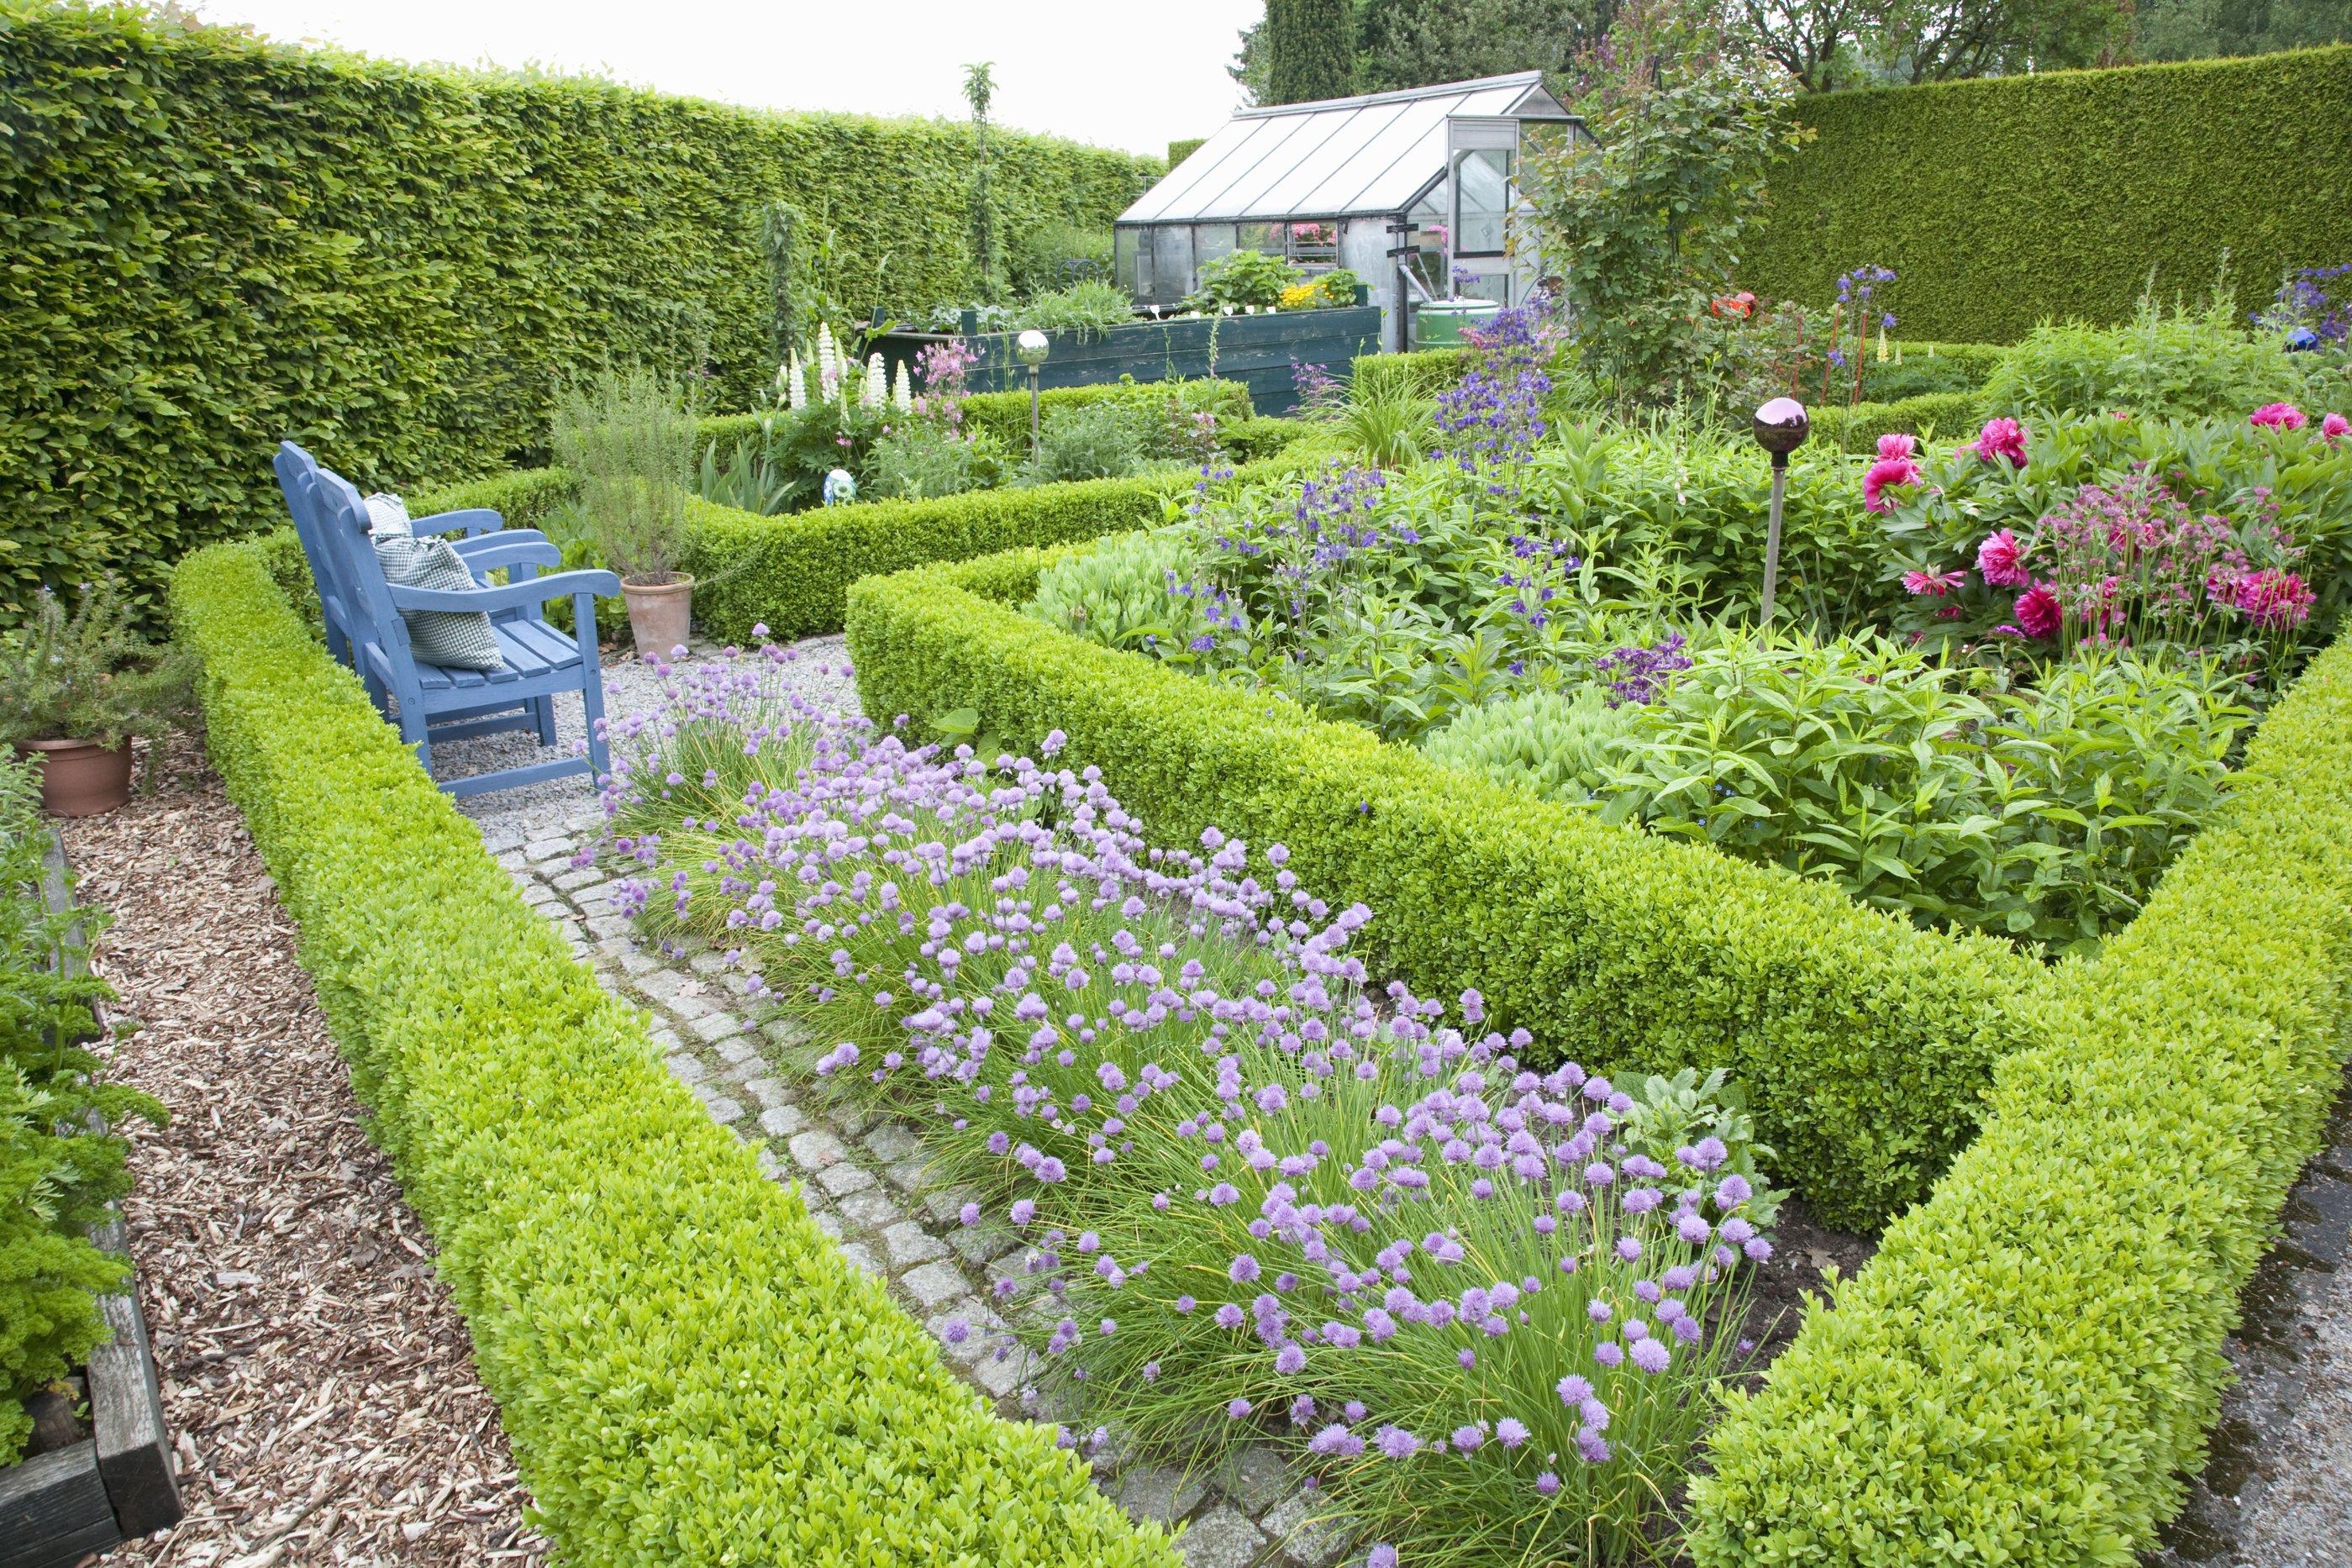 38516-fagus-beech-boxwood-buxus-hedge-country-knot-garden.jpg